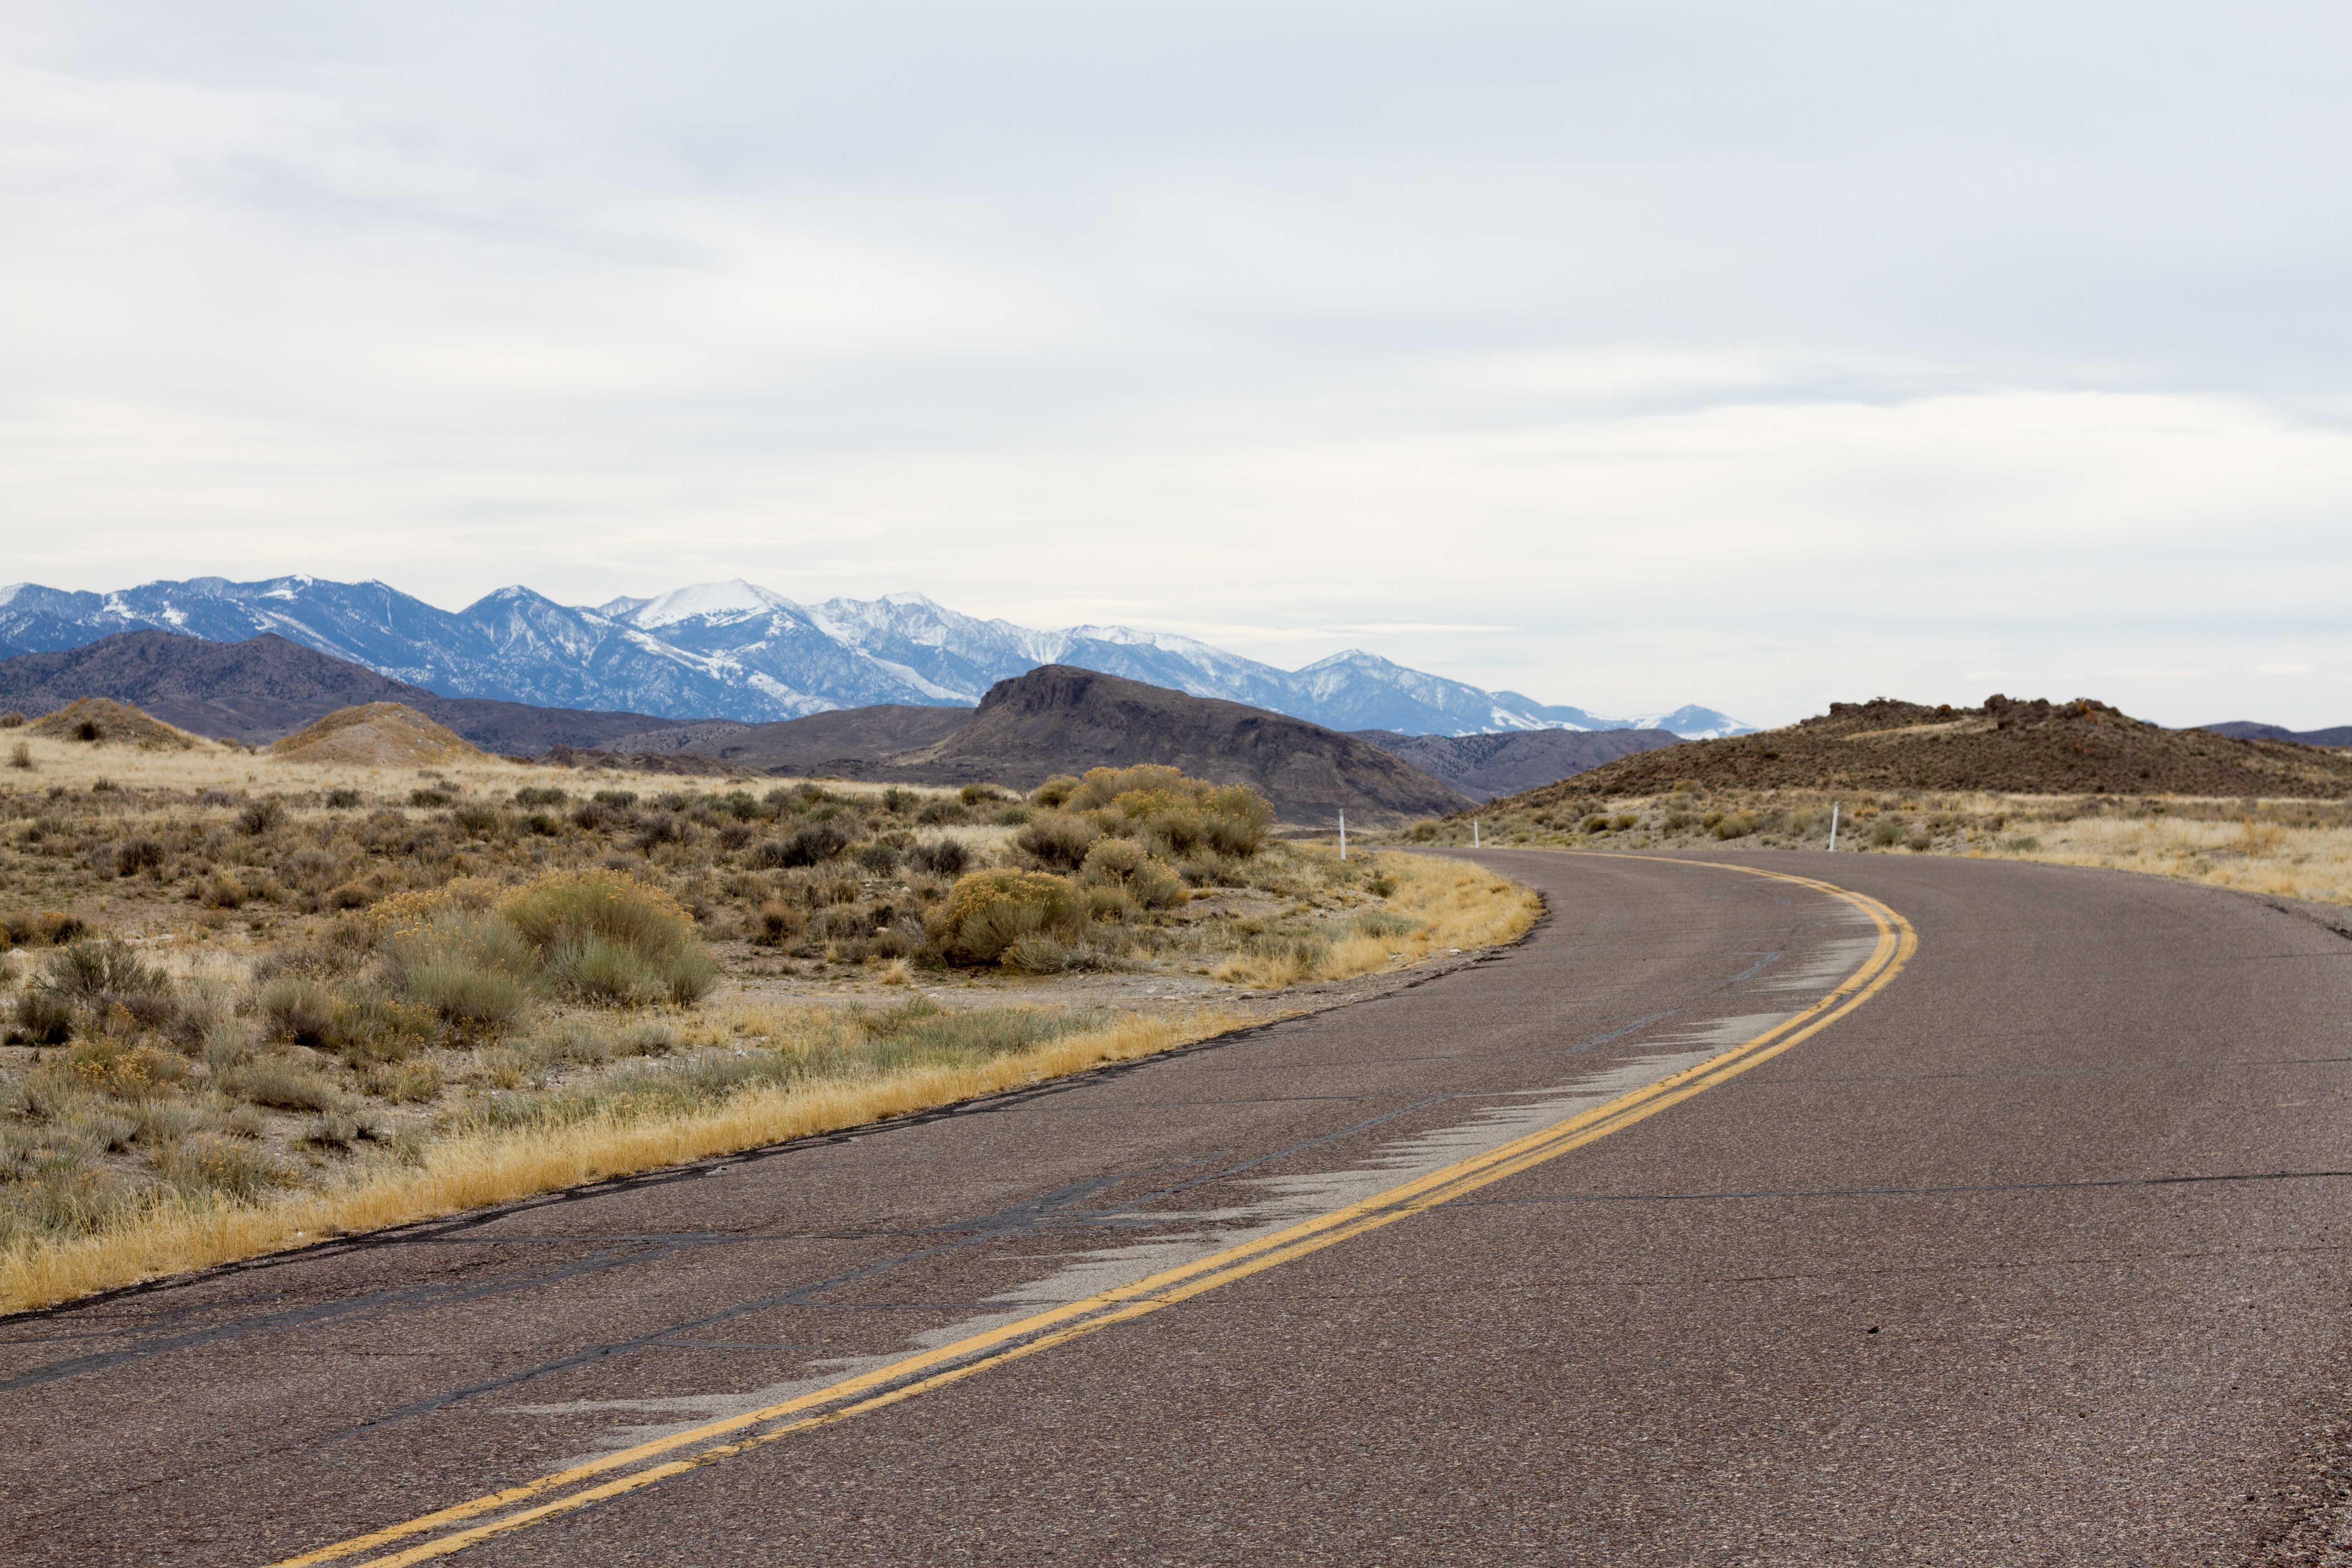 Nevada's 93-A South